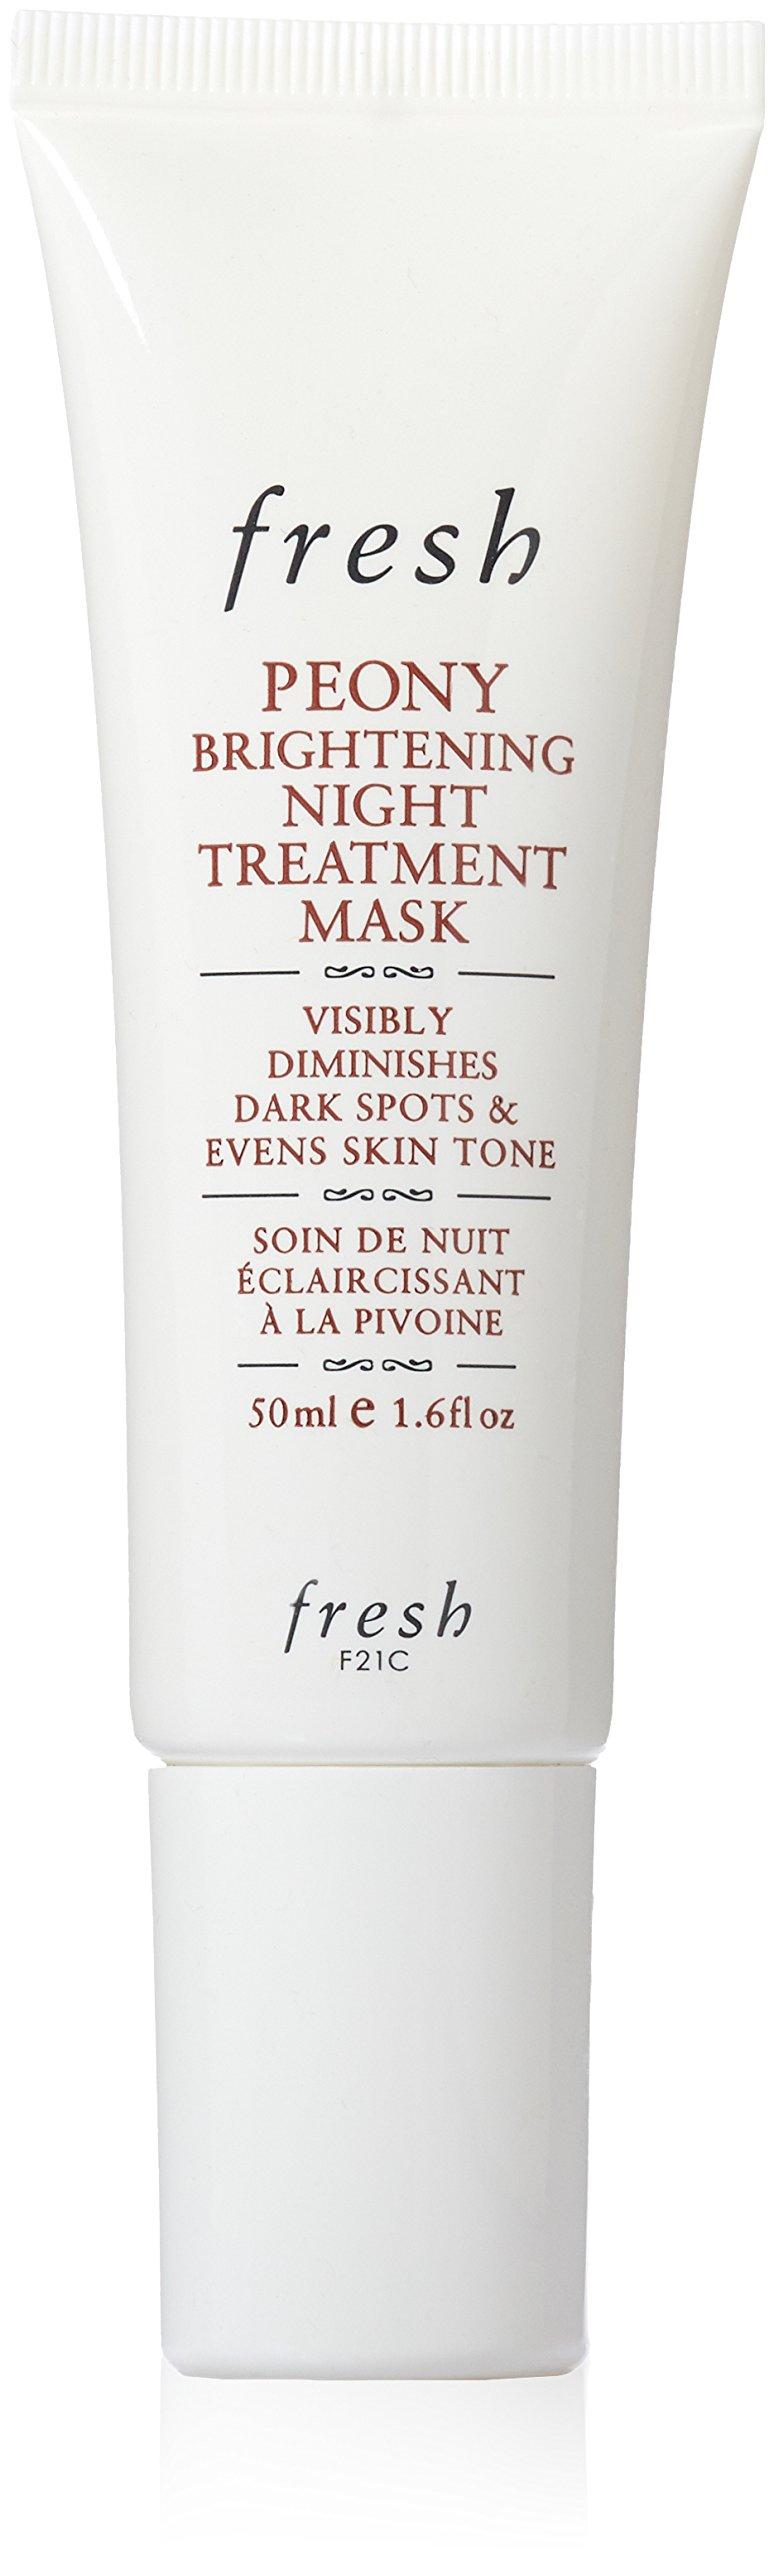 Fresh - Peony Brightening Night Treatment Mask - 50ml/1.6oz